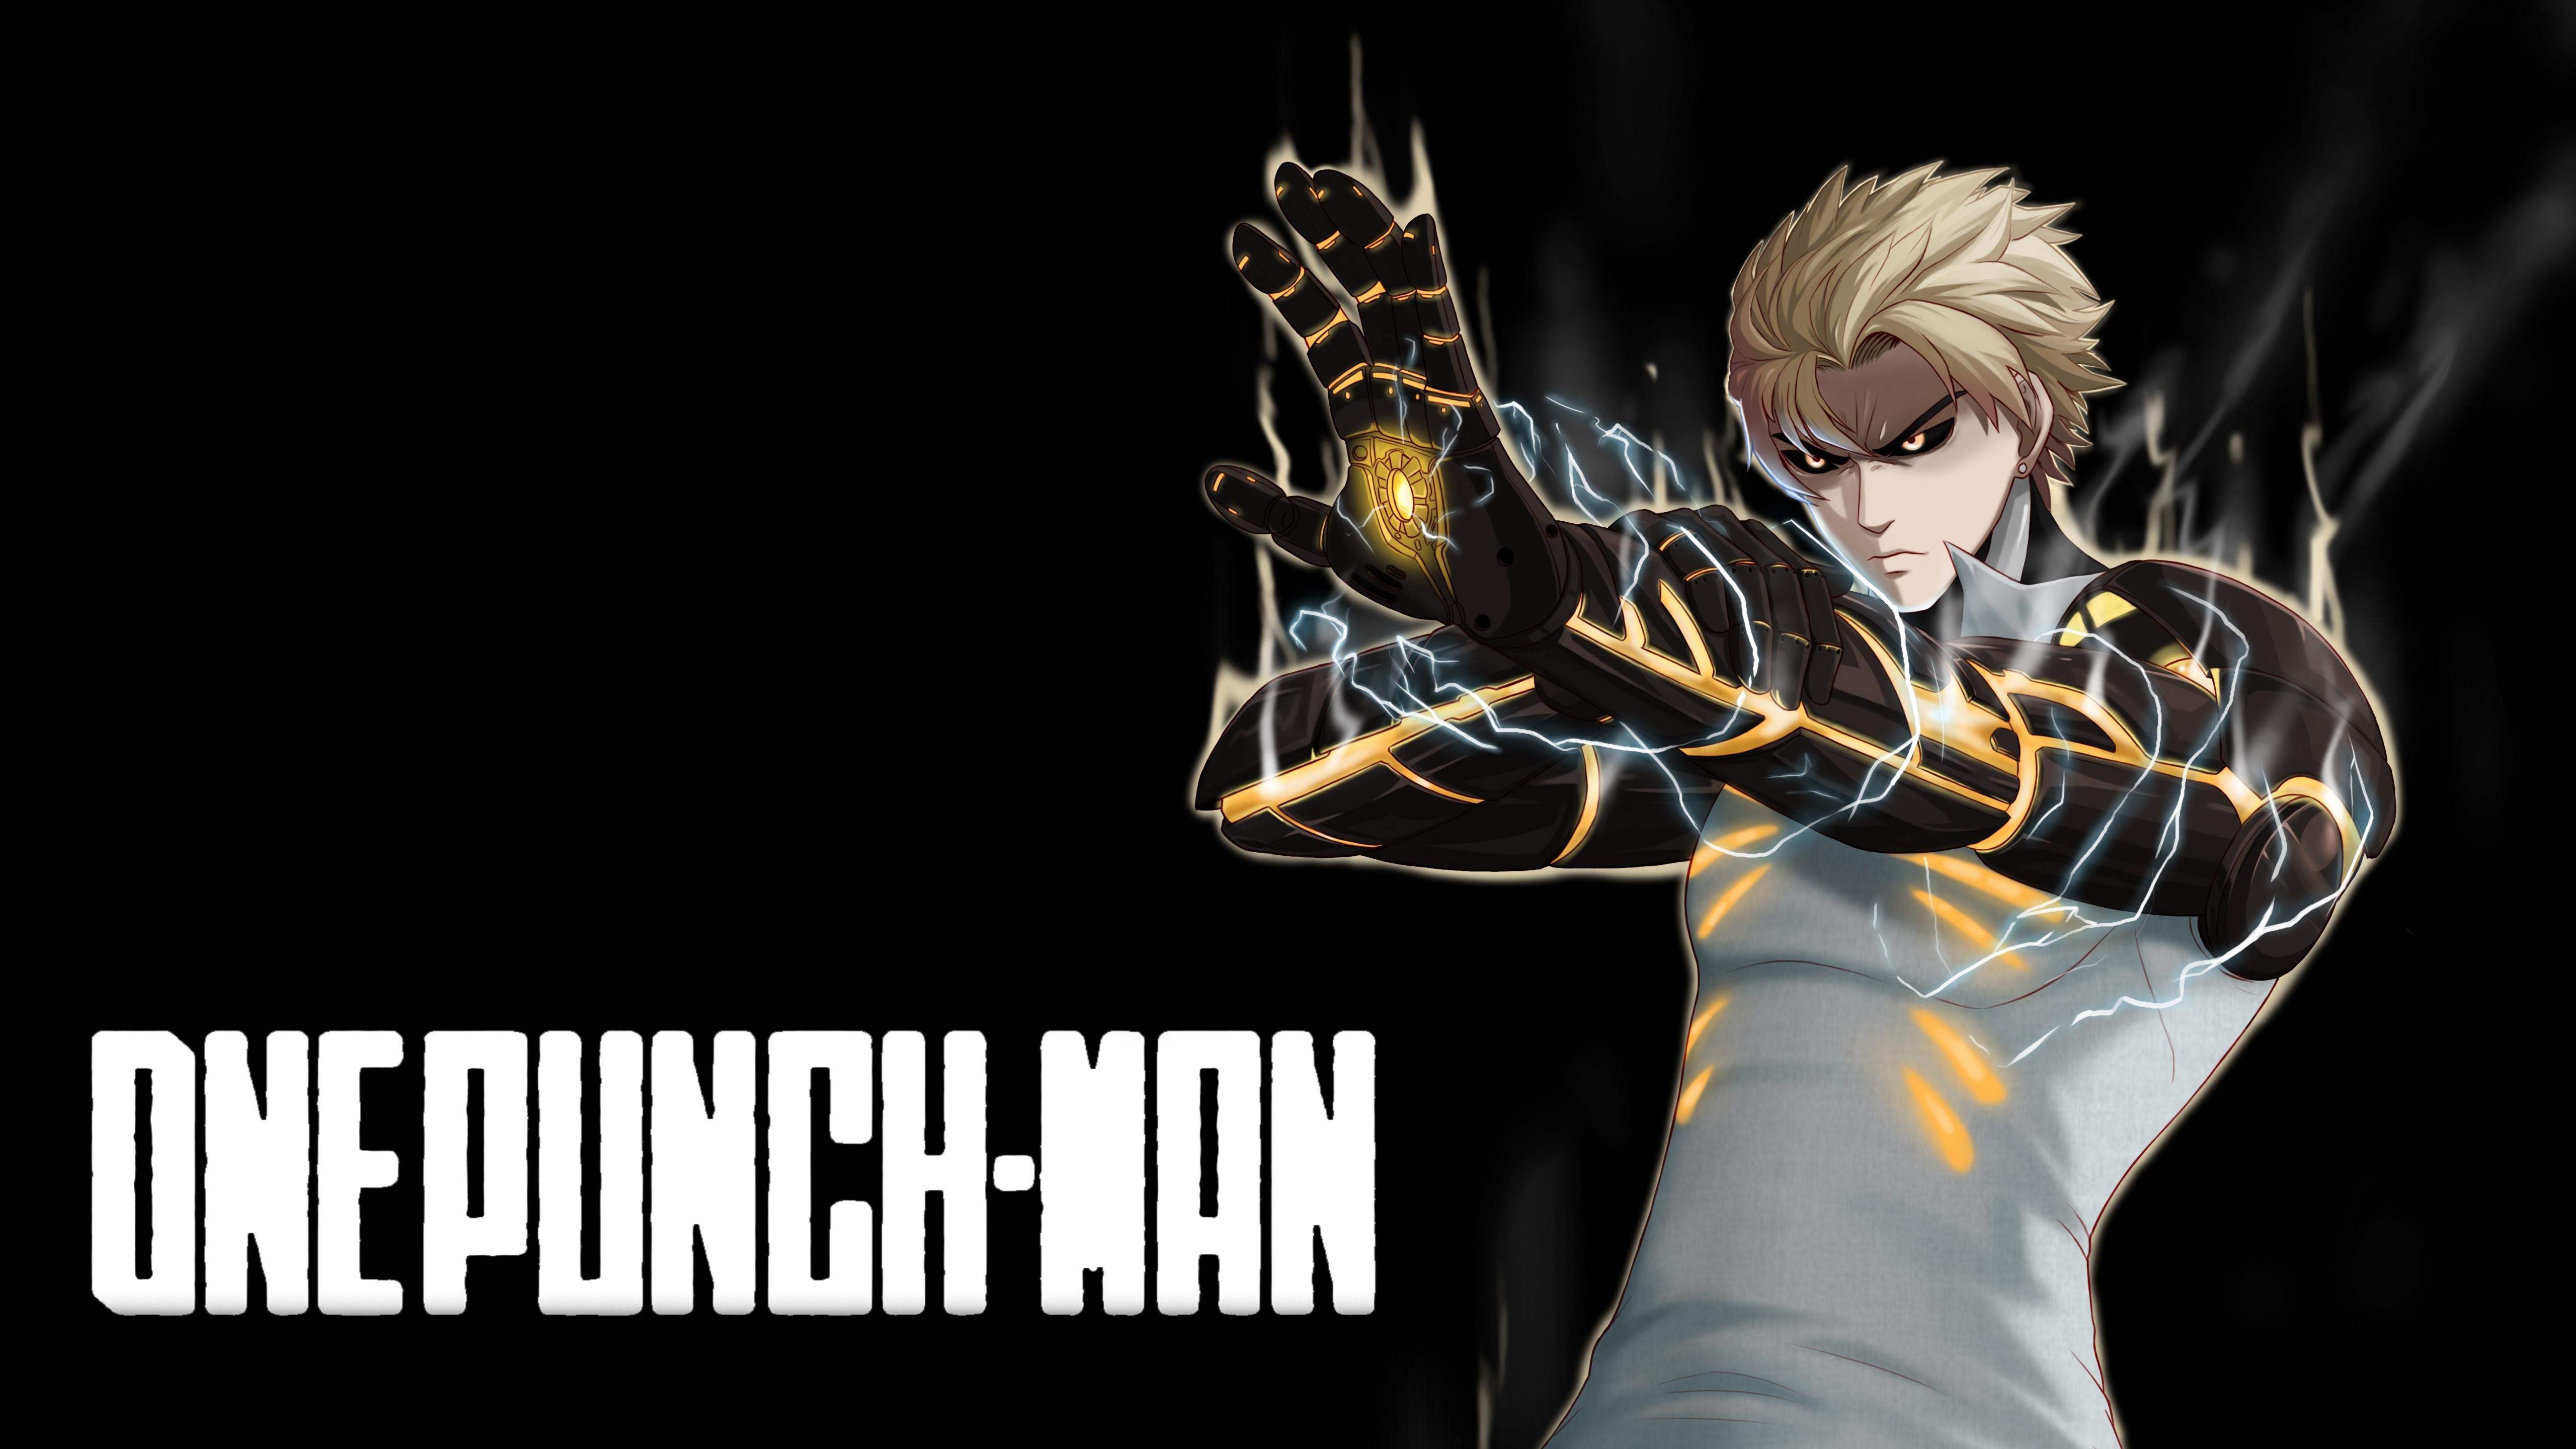 5120x2880 Genos One Punch Man 5k Wallpaper Hd Anime 4k Wallpapers